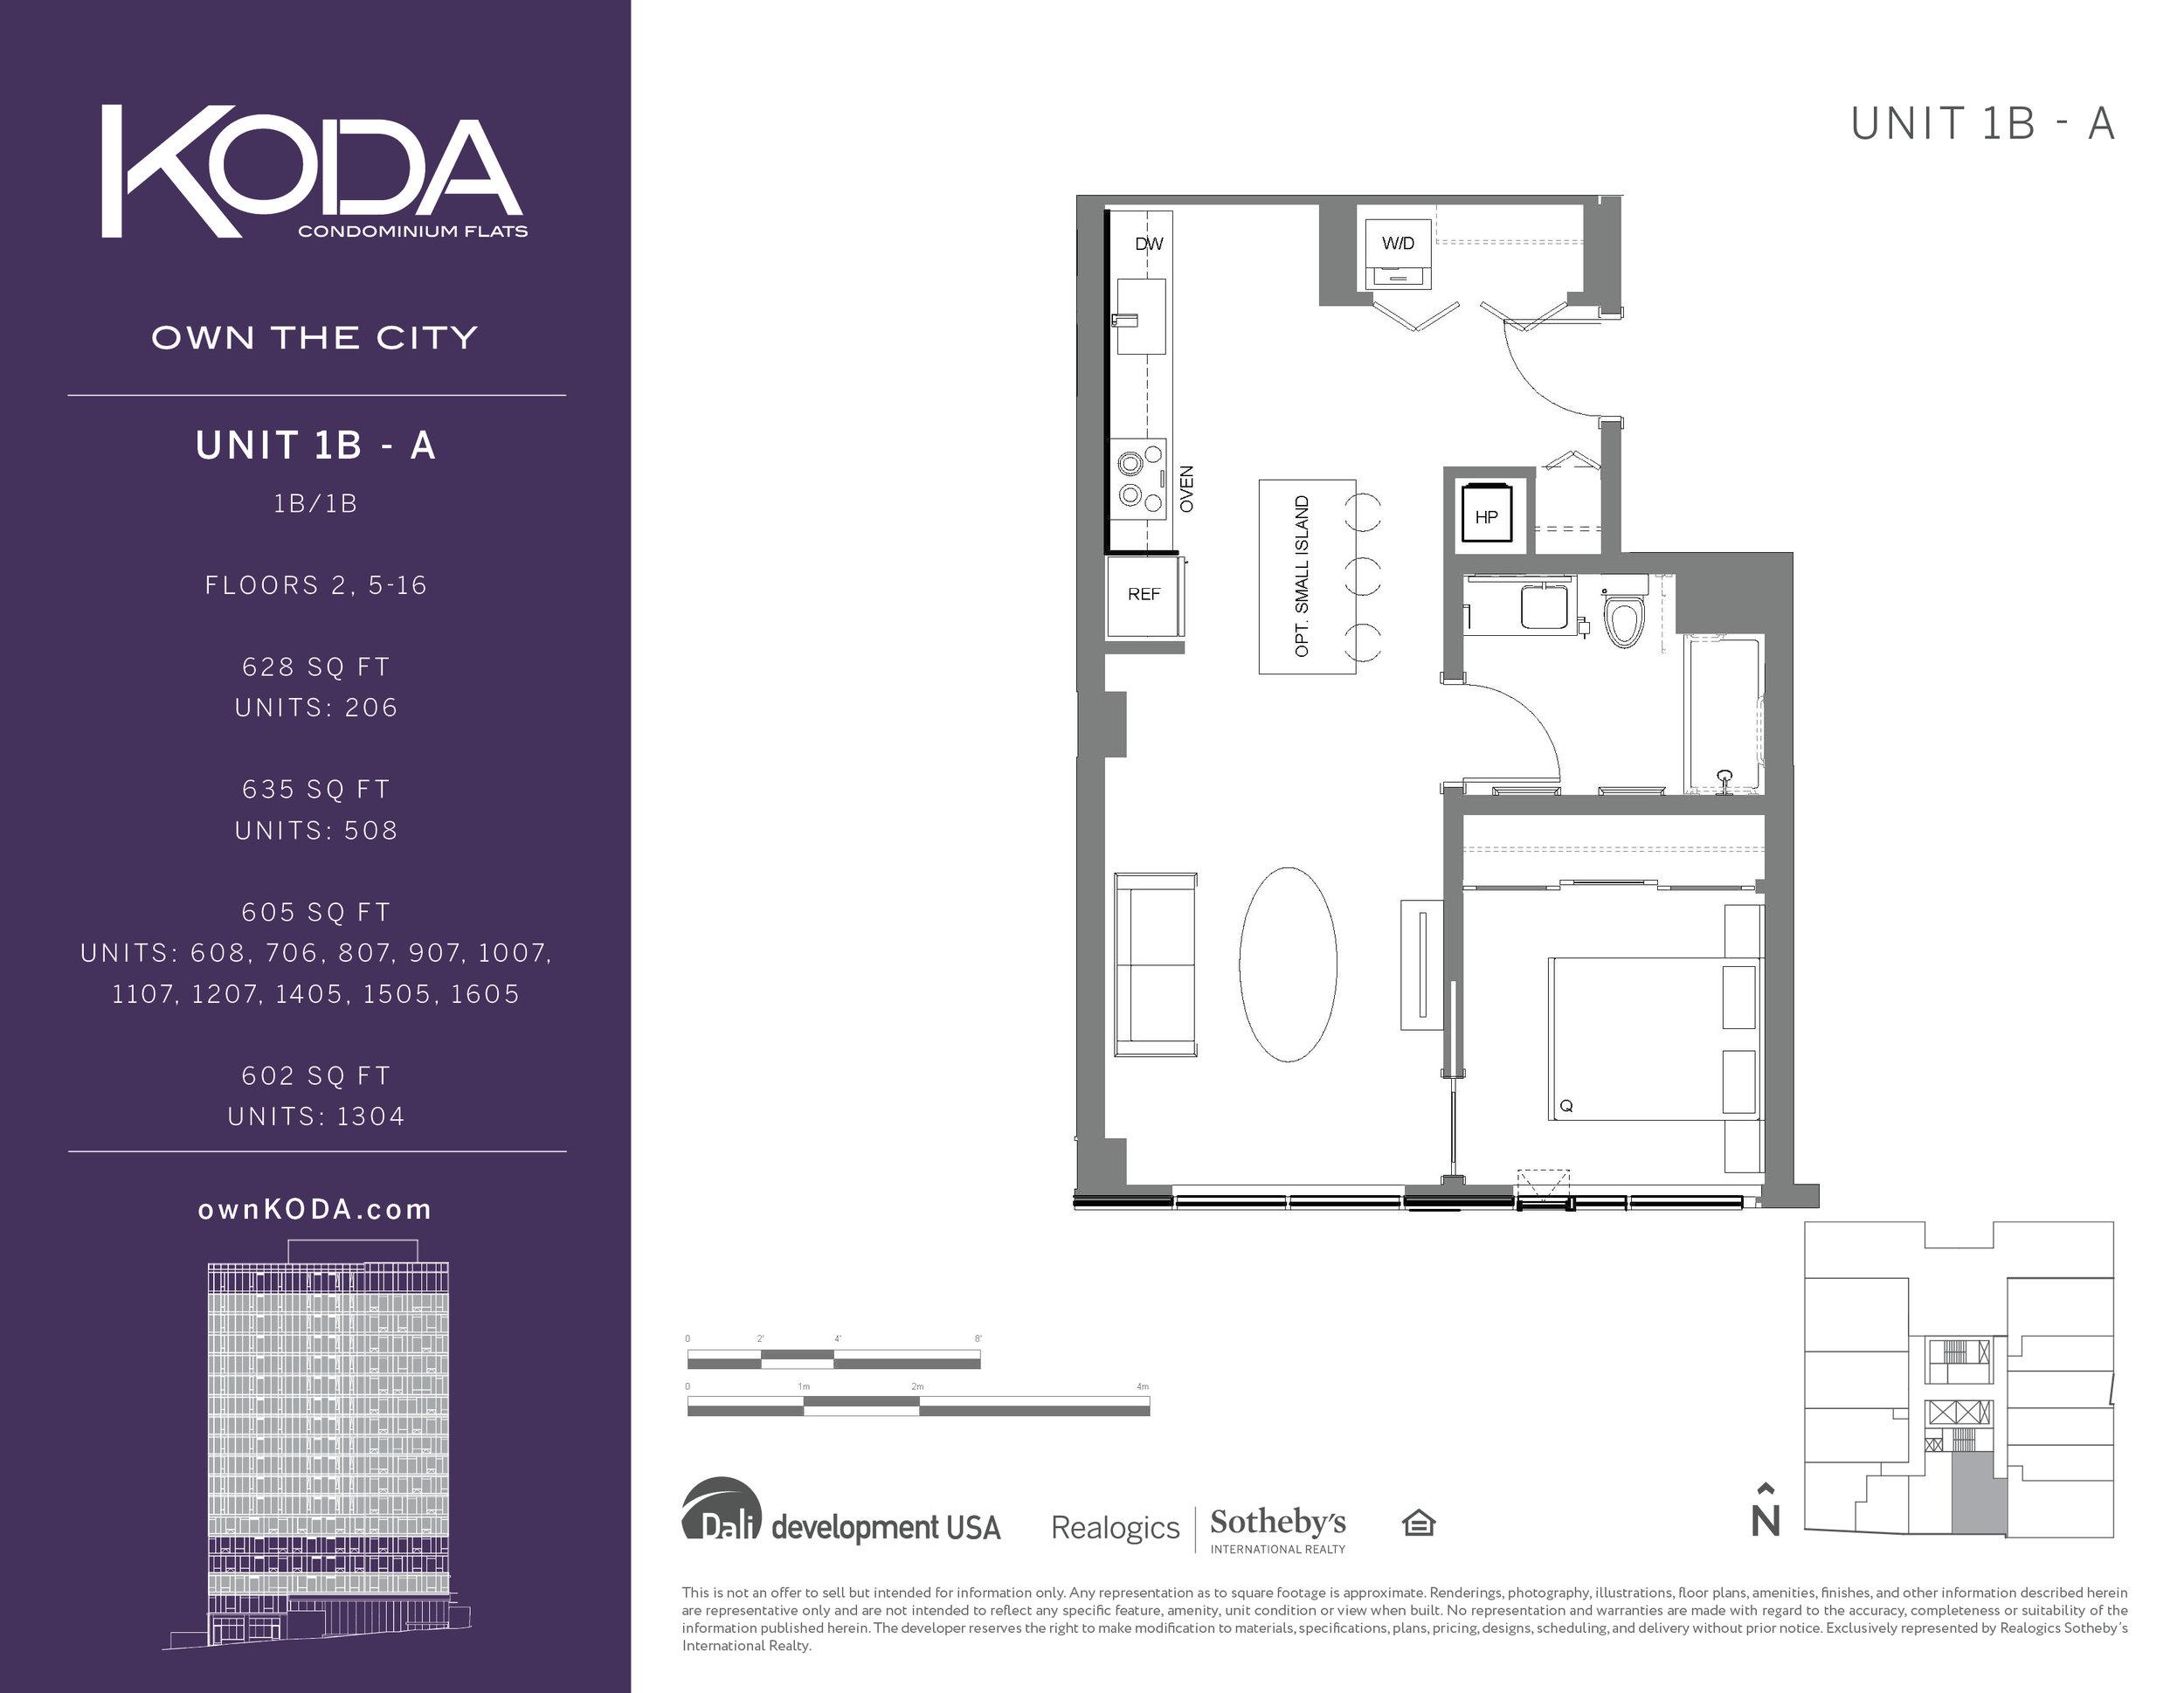 KODA_FloorPlanFlyer_Update_Approved_04.04.19_Release22.jpg